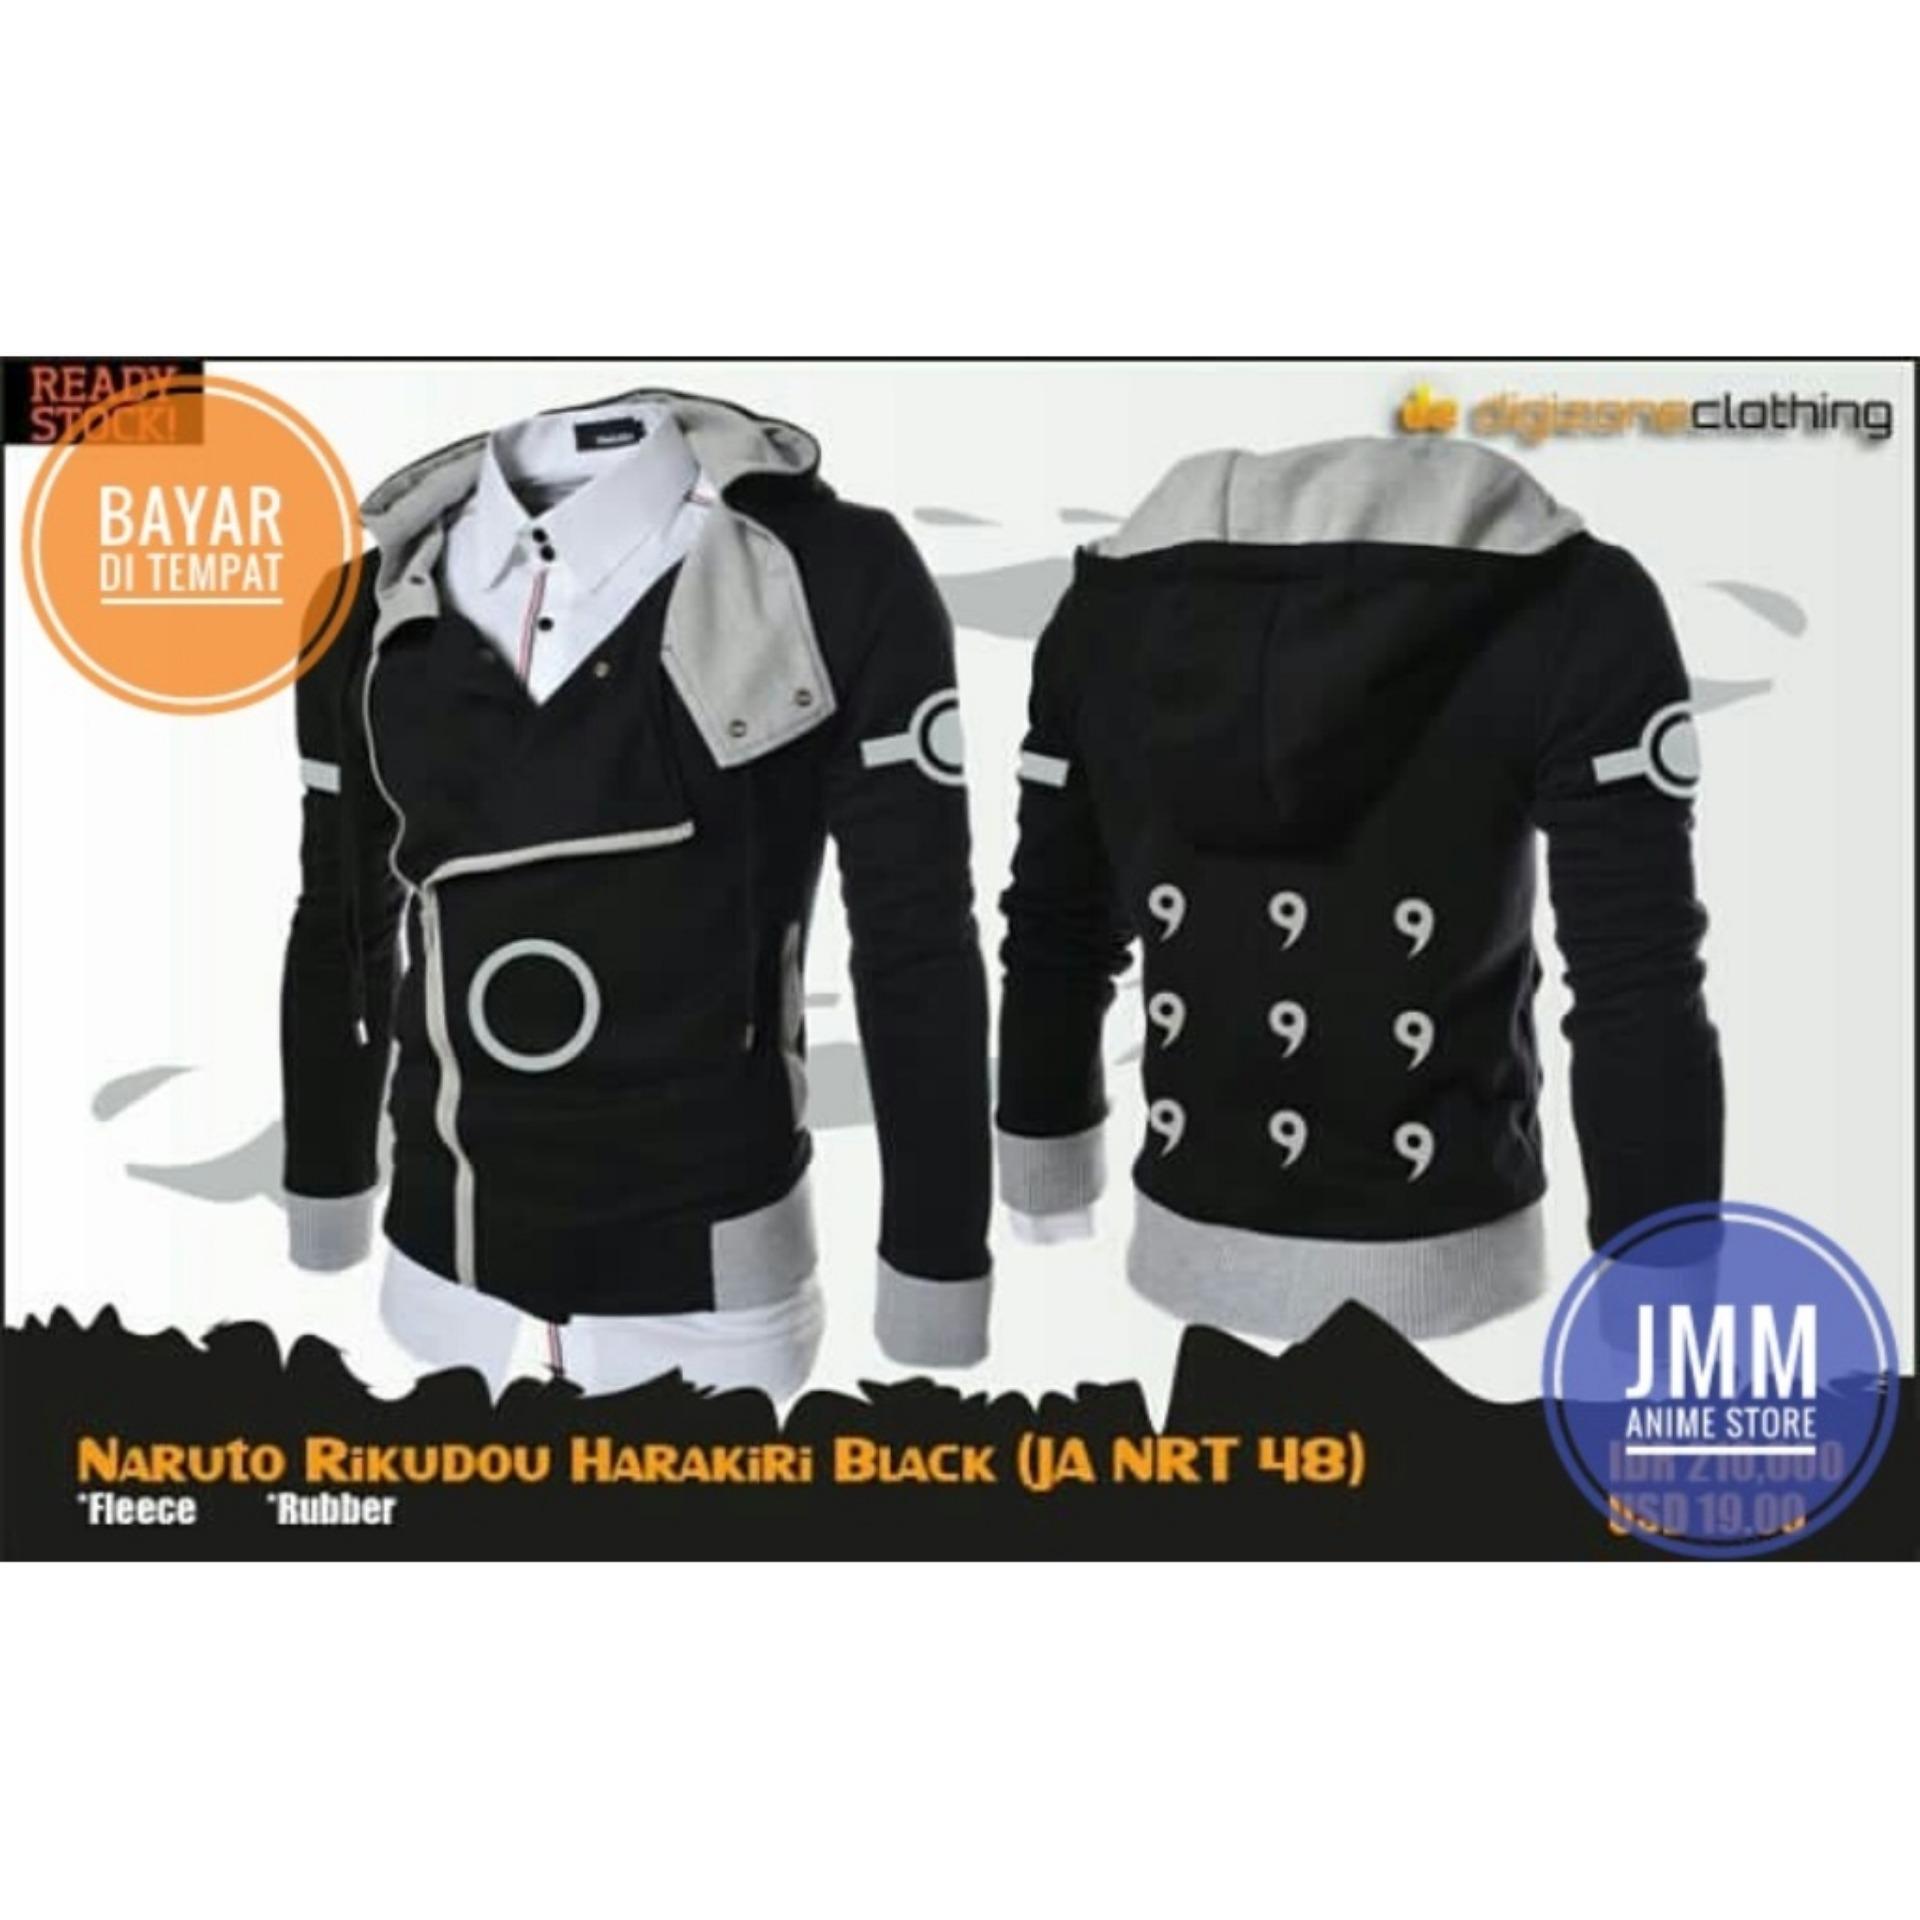 Harga Jaket Anime Naruto Cosplay Rikudou Sennin Harakiri Style Black Hoodie Best Seller Dan Spesifikasinya